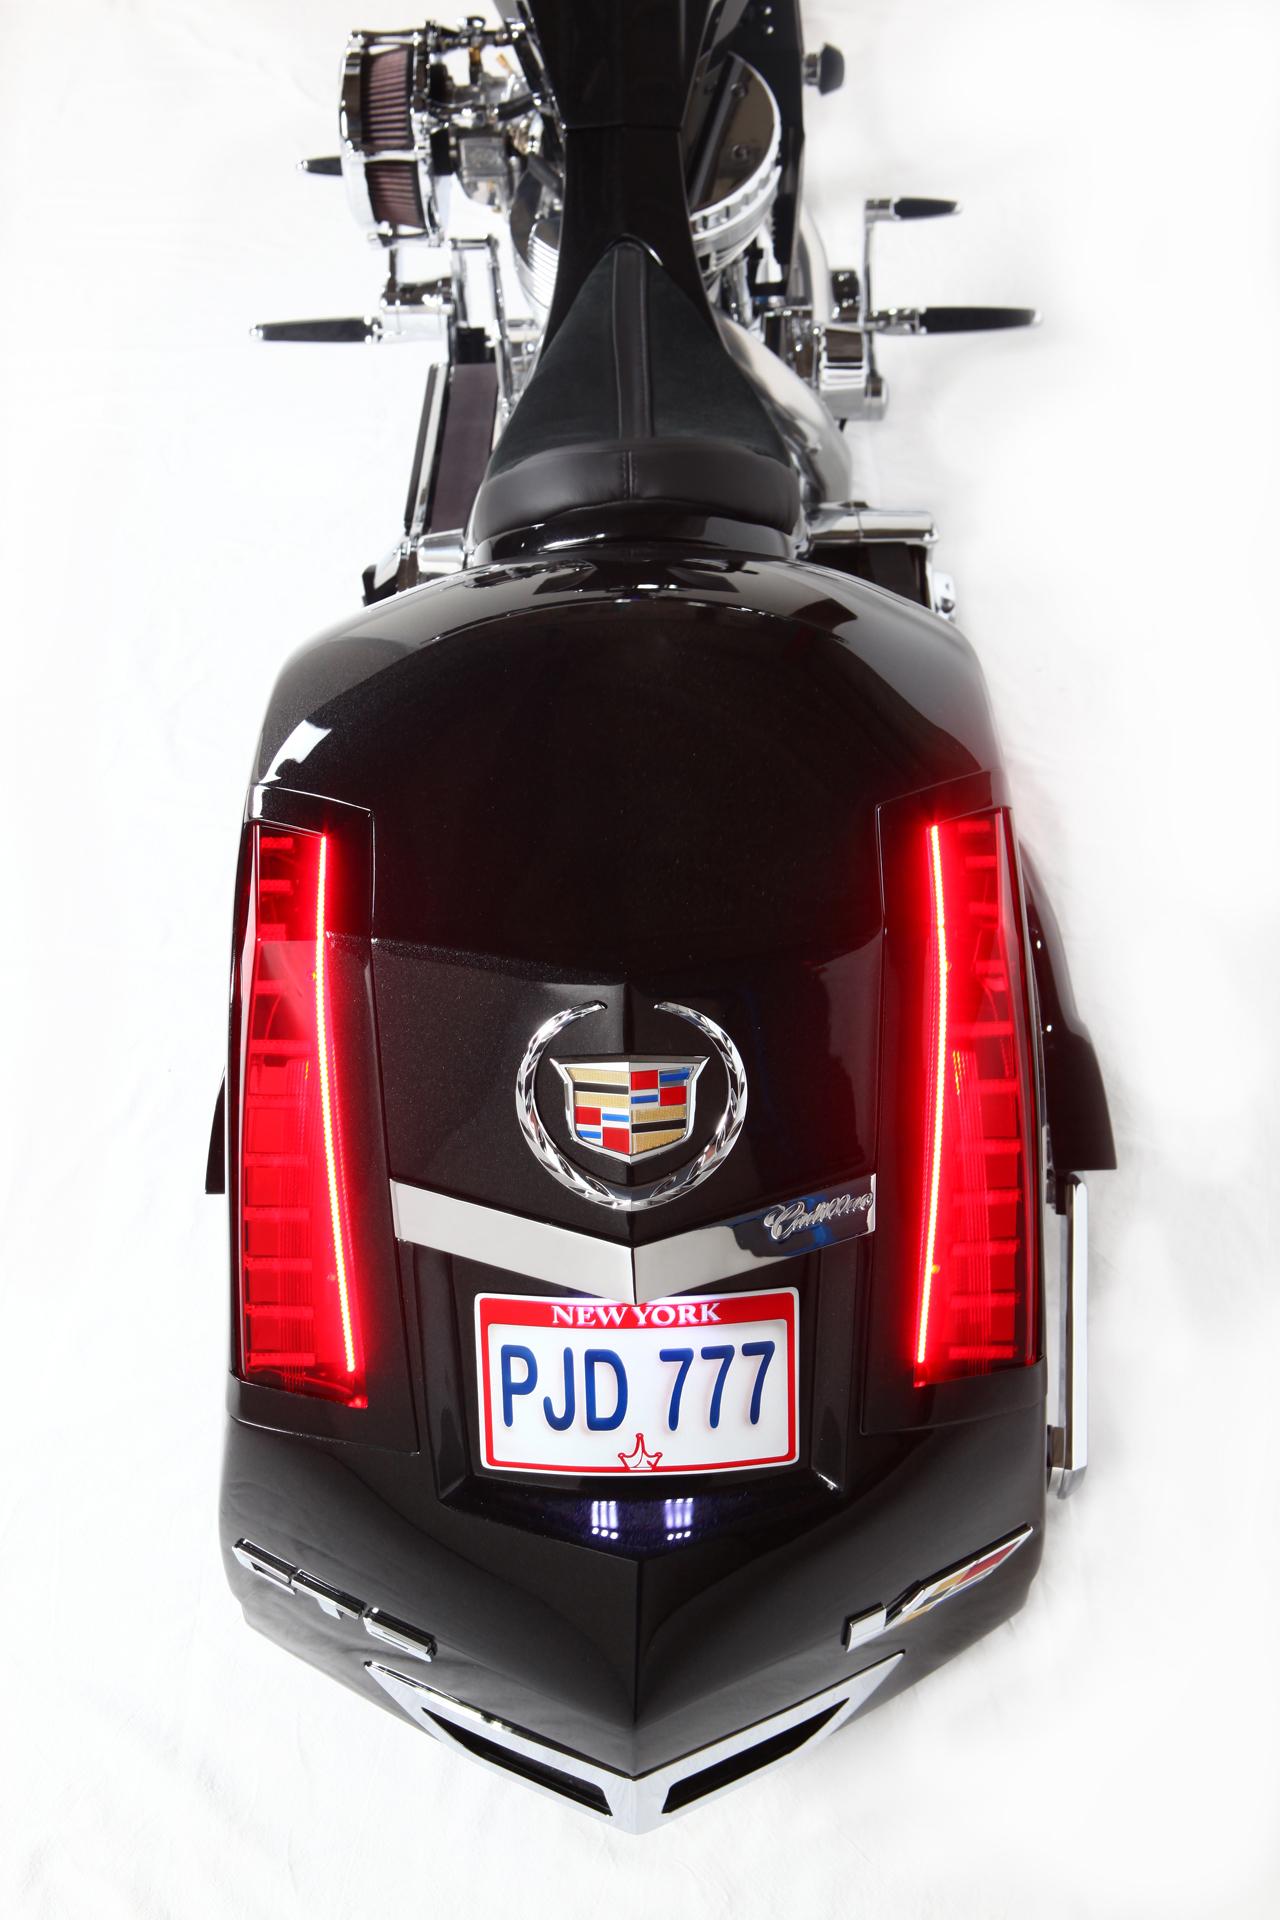 Senior Vs Junior American Chopper Cadillac Bikes Up For Grabs